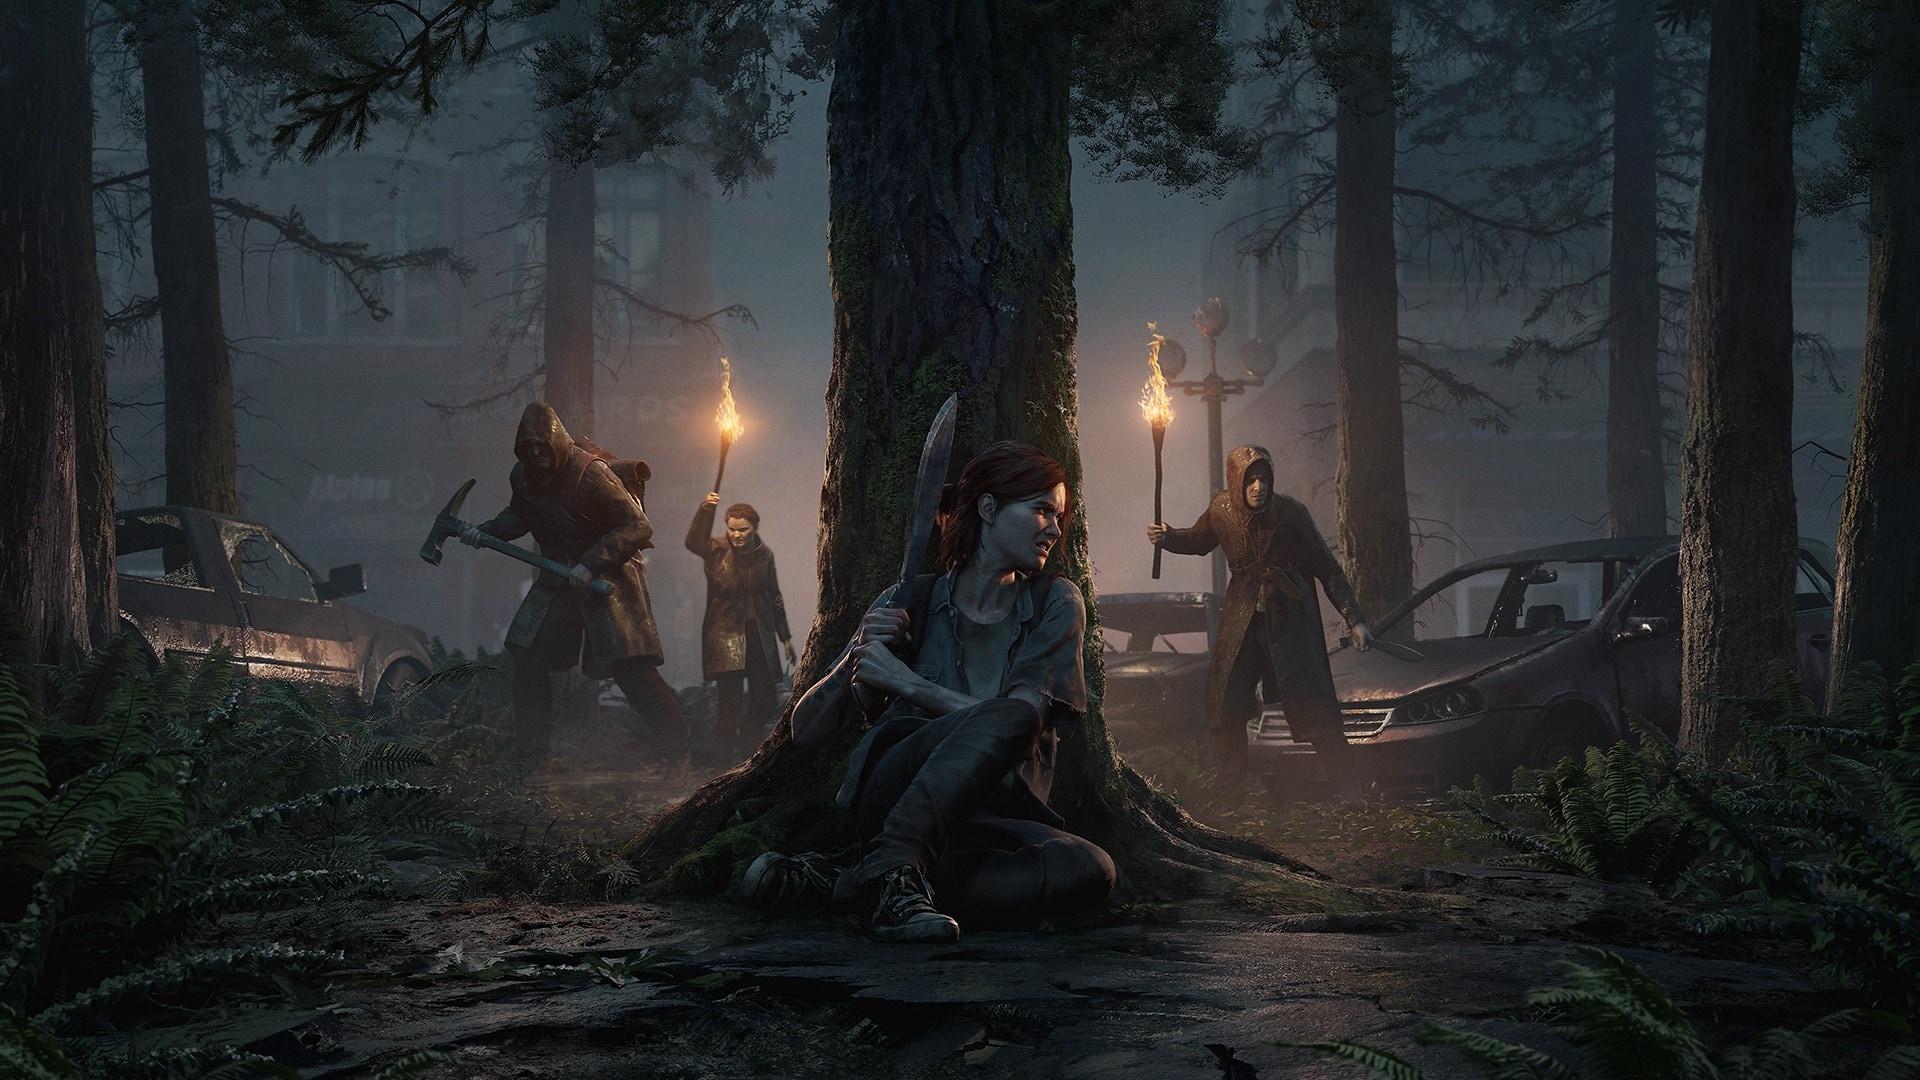 The Last of Us 2 Wallpaper (2)